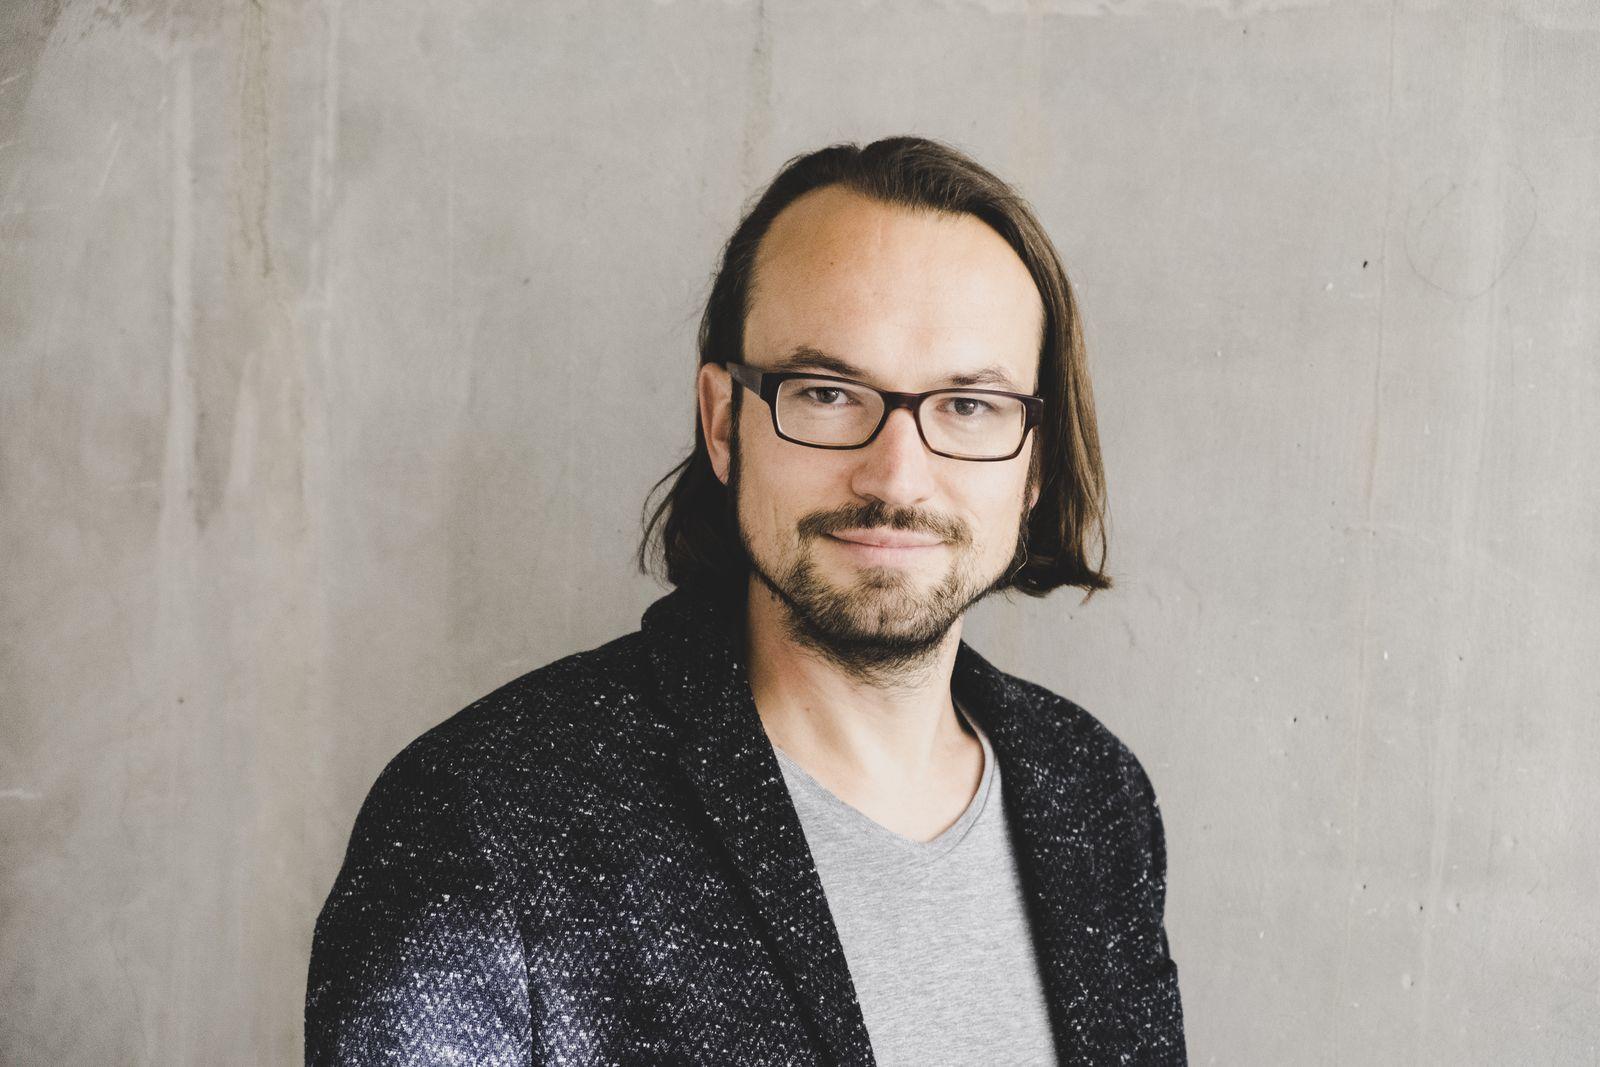 Jan Mohnhaupt